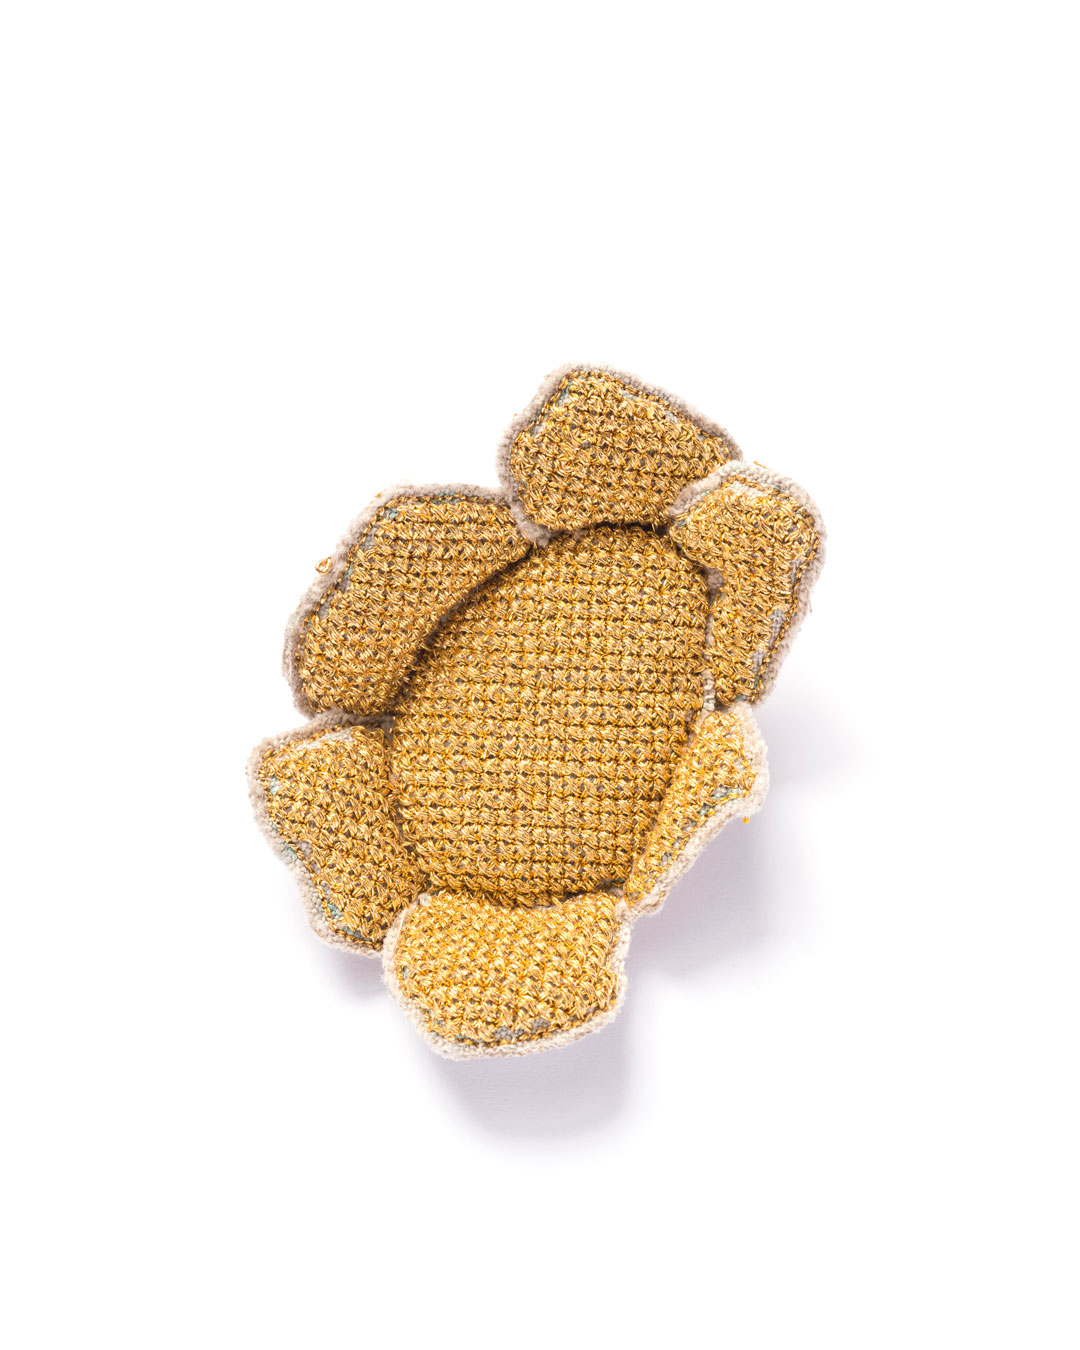 Carla Nuis, Golden Cuddles – Flower Brooch 3 (1/7), 2014, brooch; unbleached linen, 24ct gold kimono thread, linen flax fibres, 80 x 60 x 20 mm, €1250